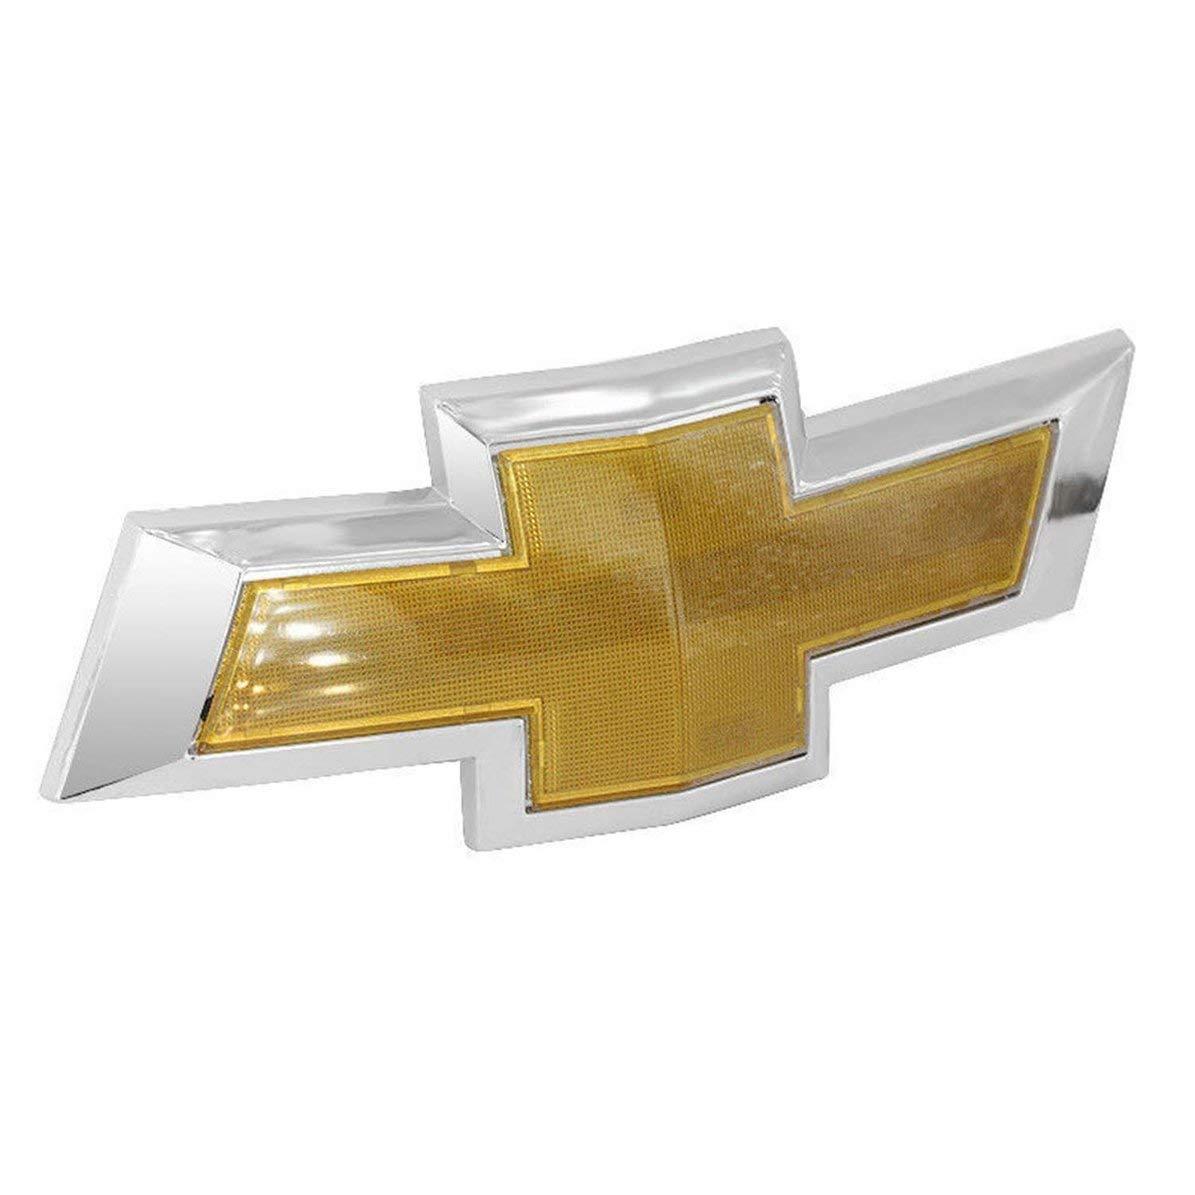 Corneliaa-DE Chrom-Logo-Zeichen-Auto-Fronthauben-Emblem-Namensschild f/ür Chevrolet Cruze